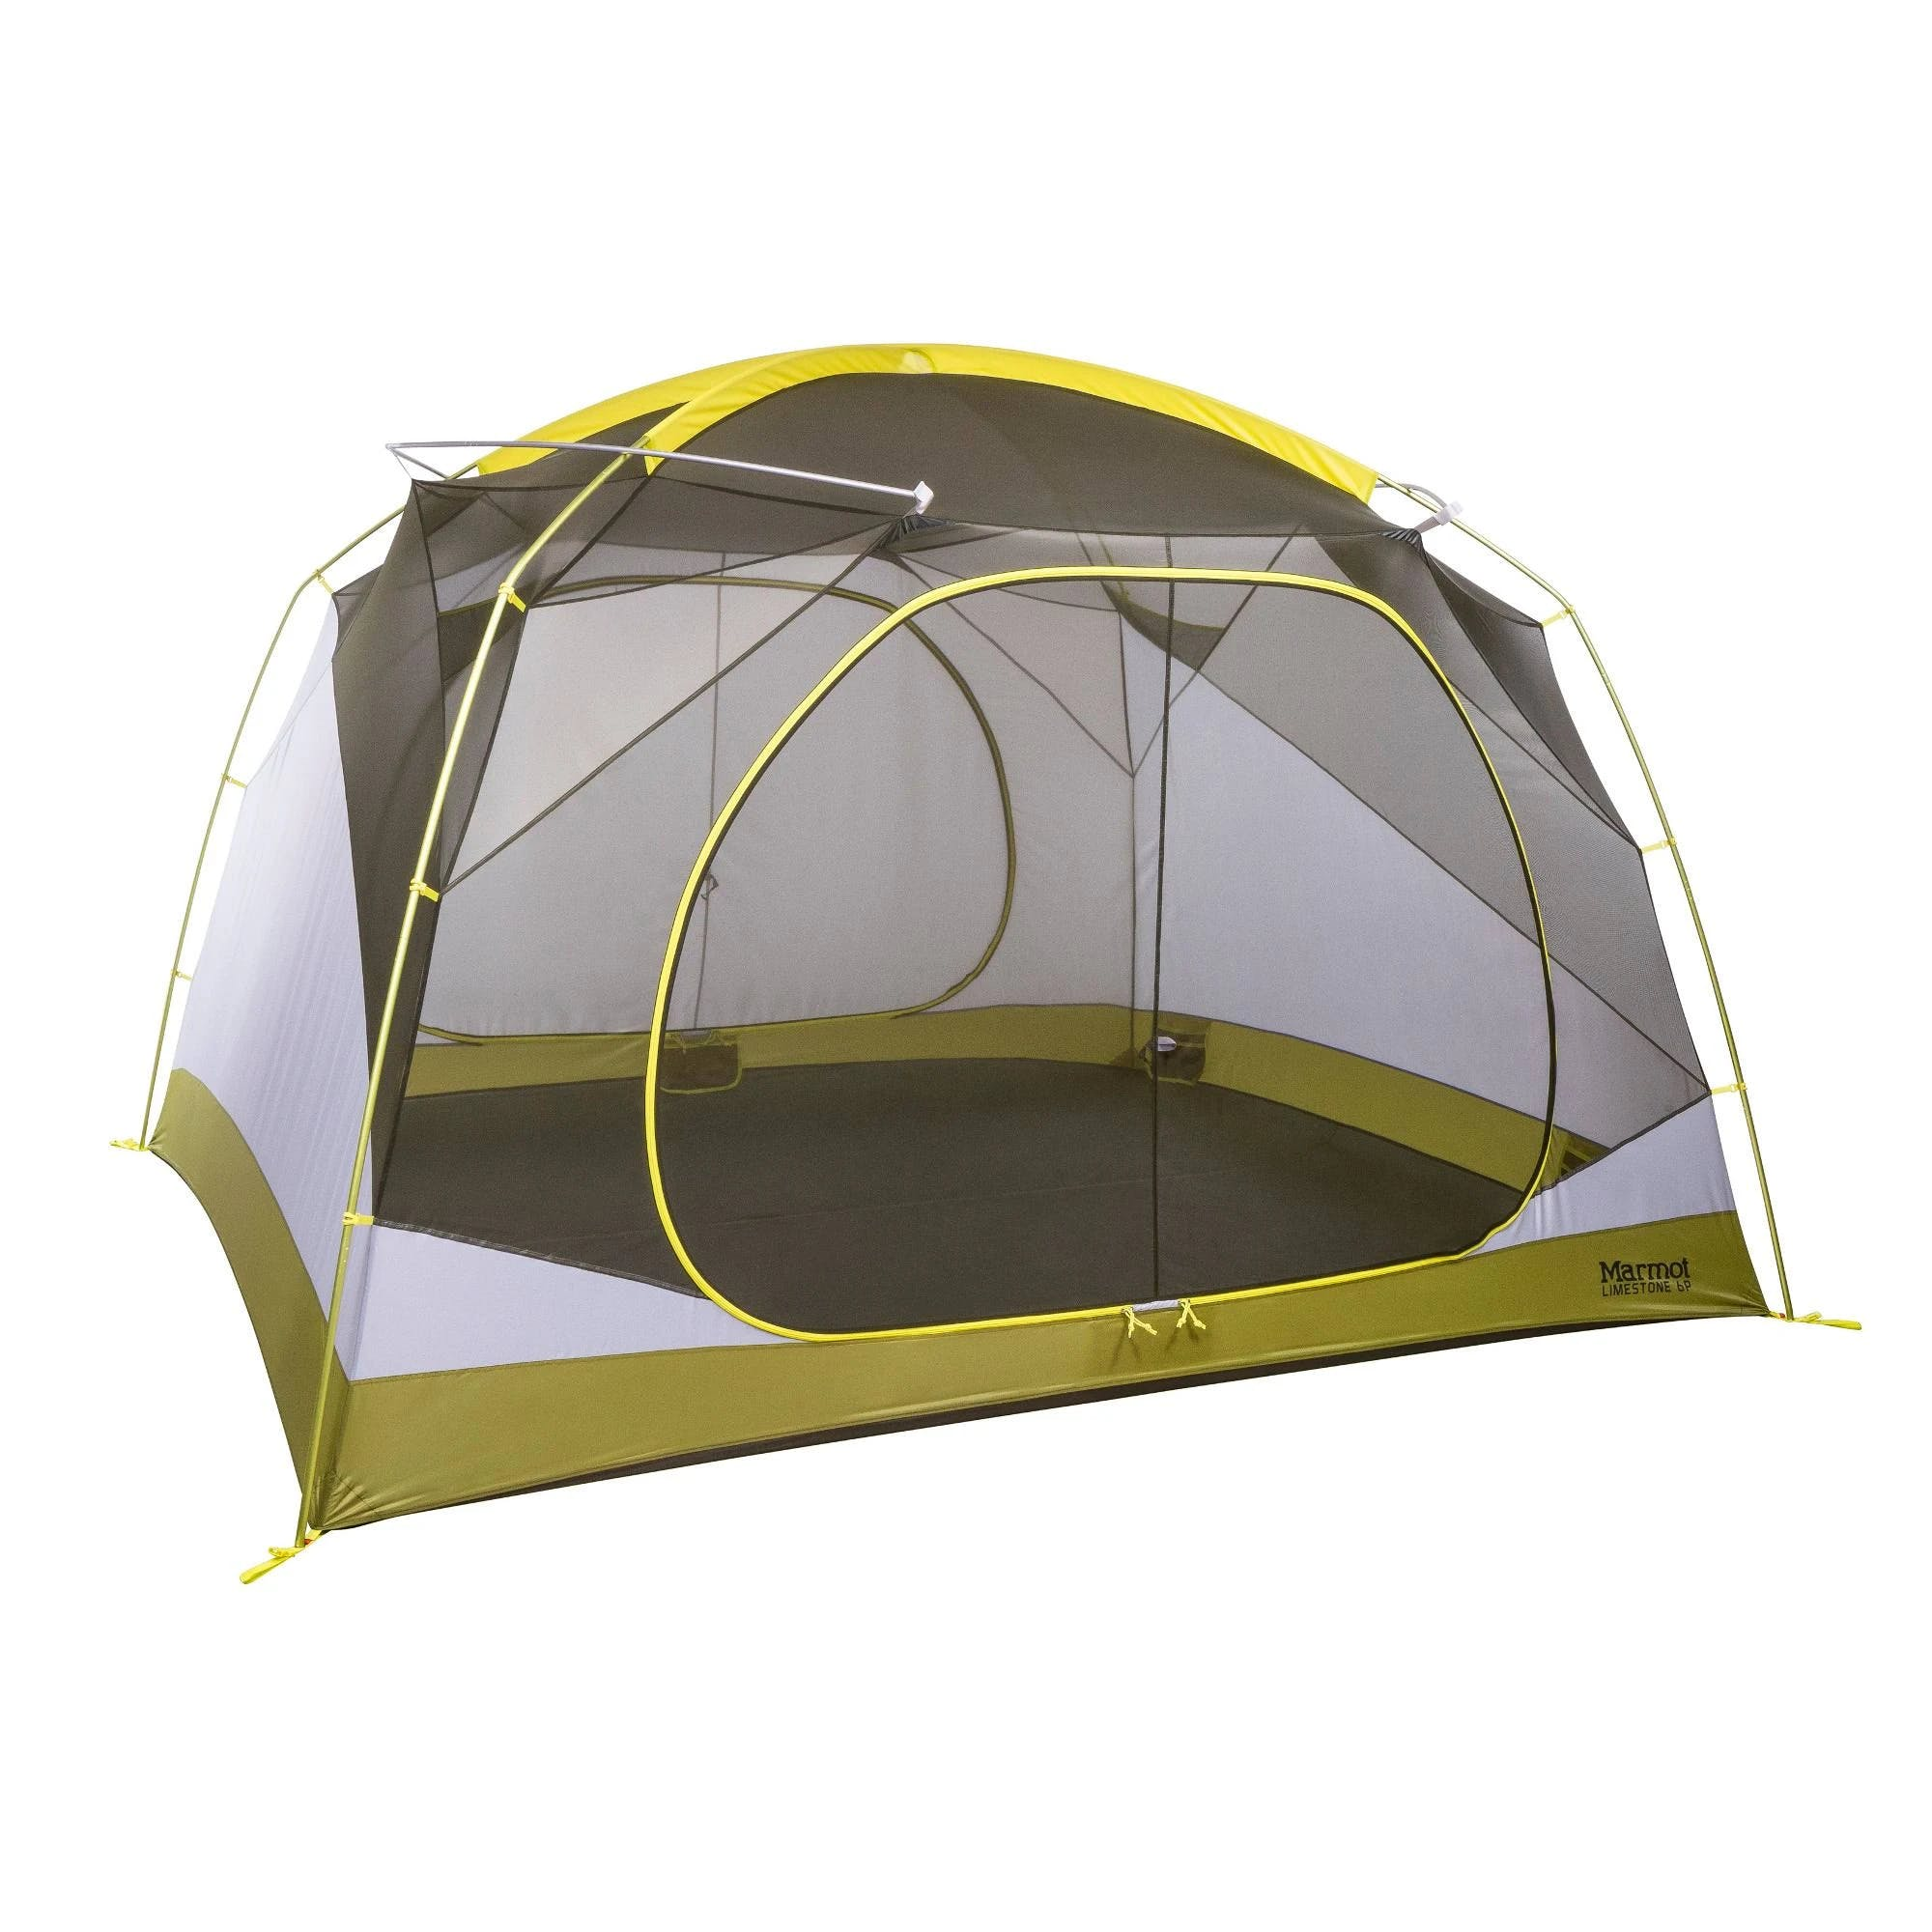 Marmot - Limestone 6p Tent - Green Shadow Moss